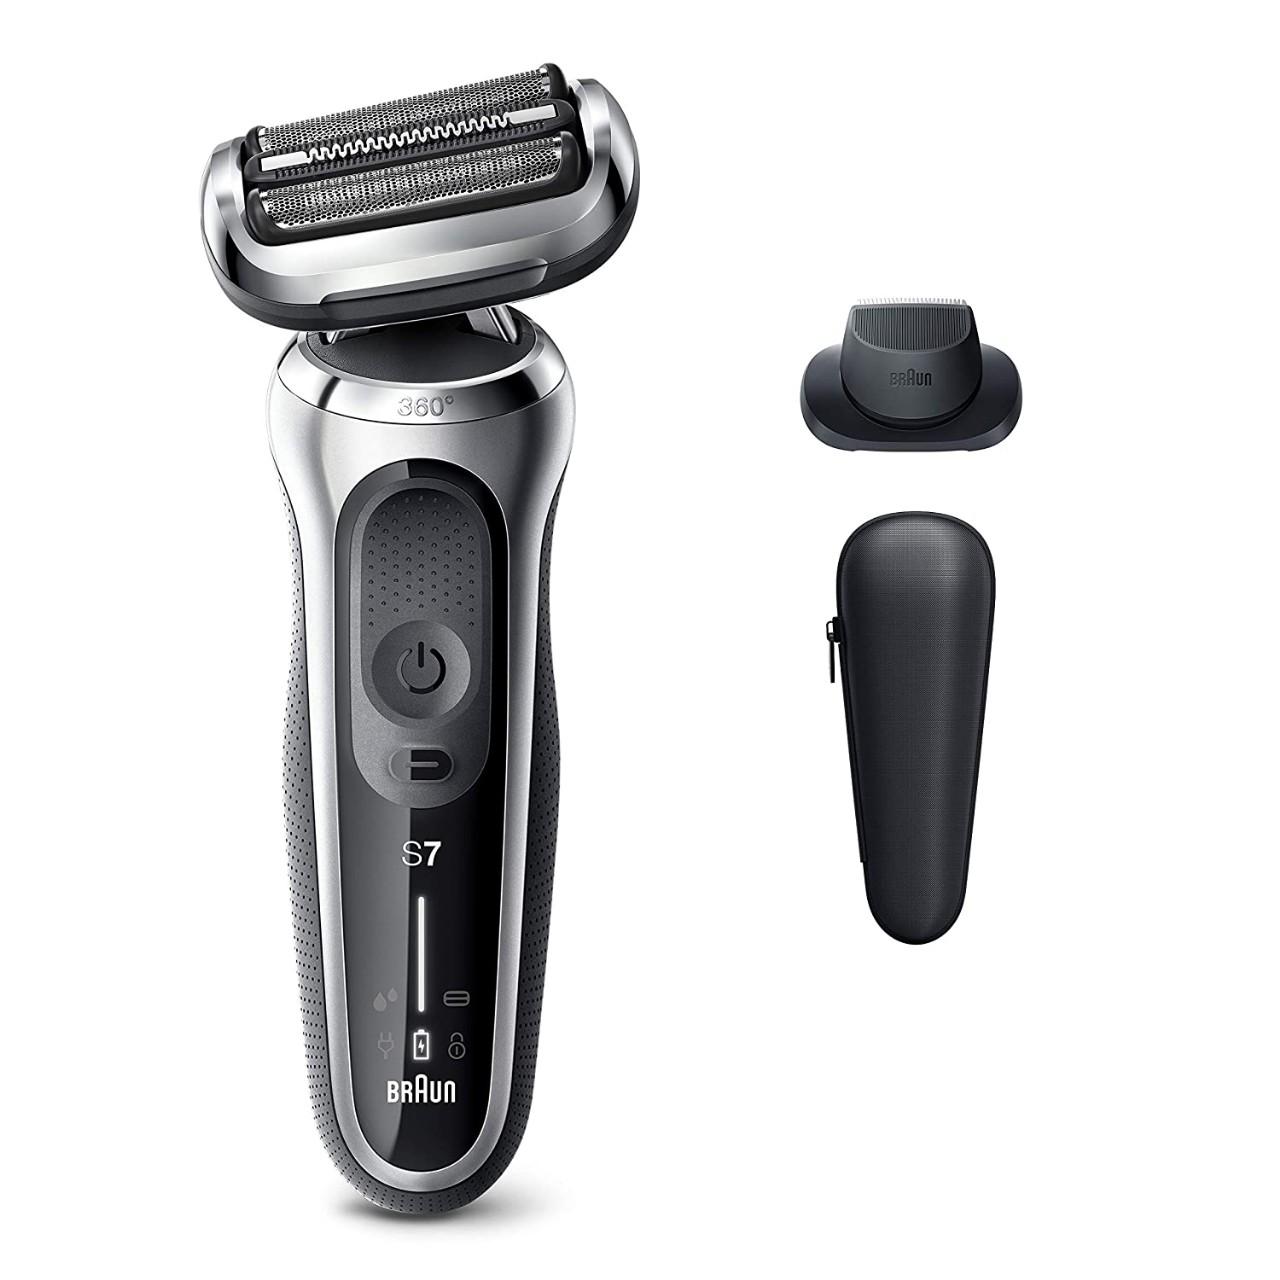 Braun Electric Razor for Men, Series 7 7020s 360 Flex Head Electric Shaver with Precision Trimmer